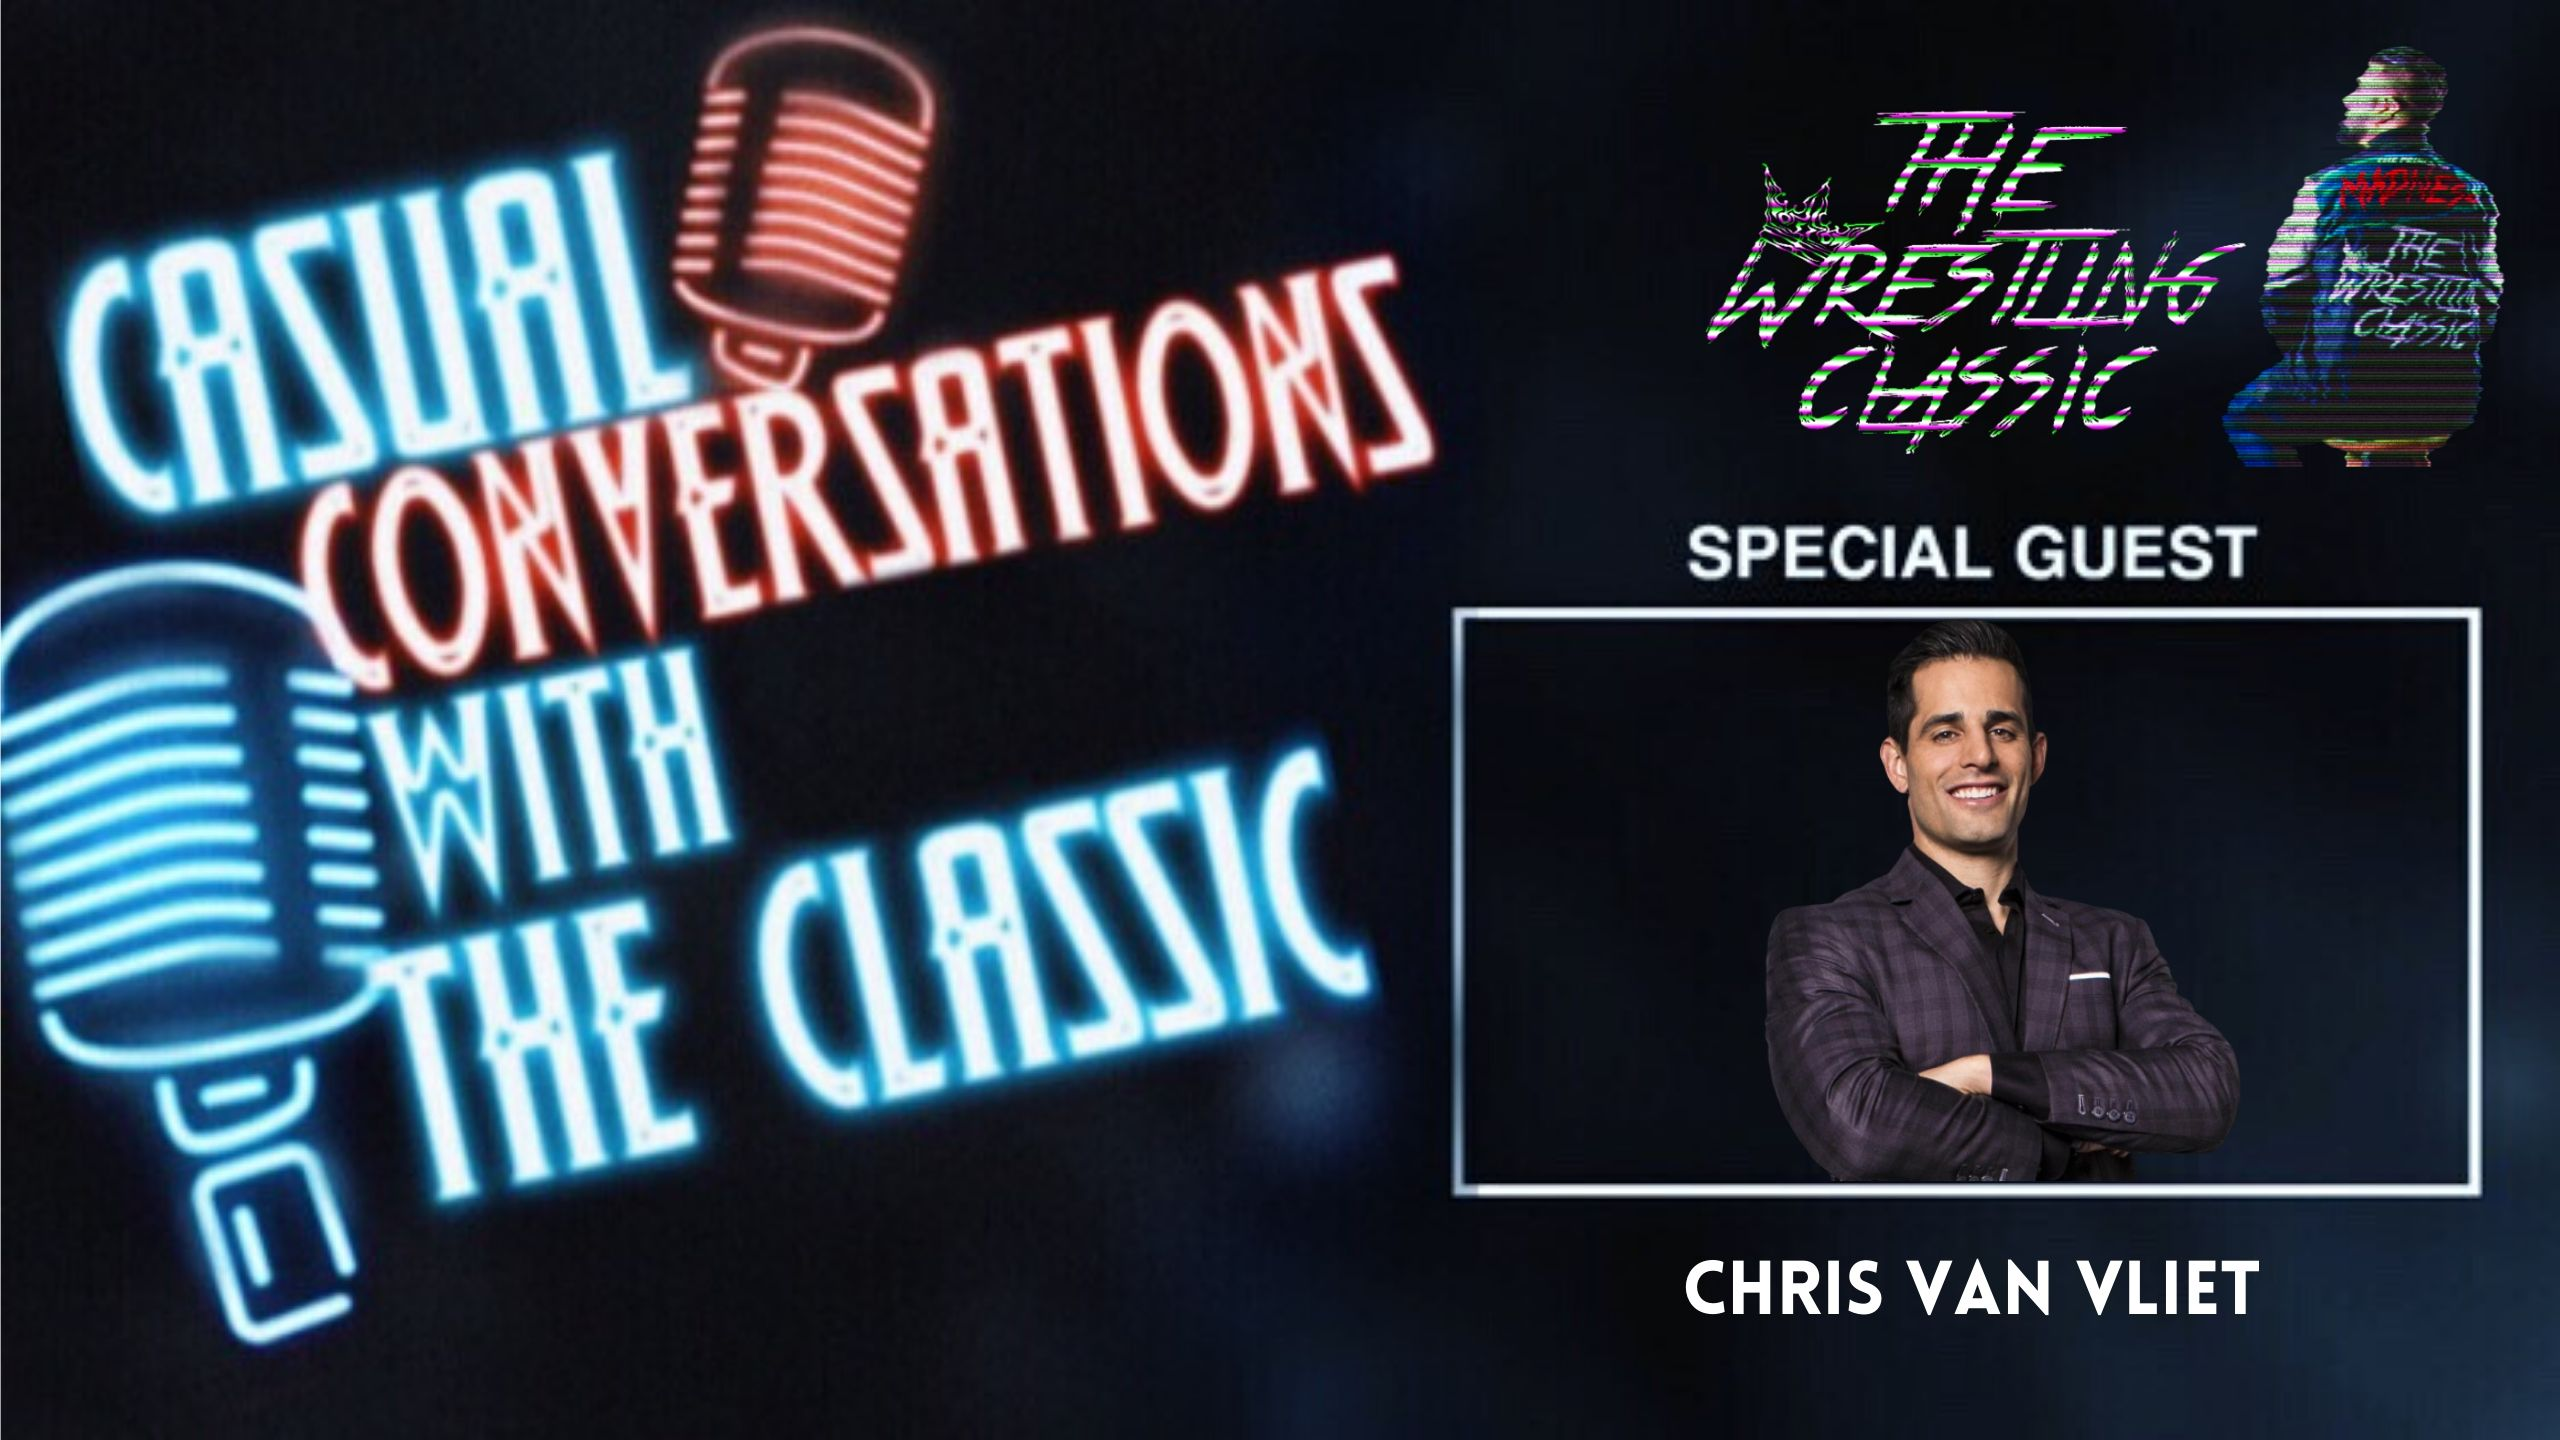 Casual Conversations with The Classic – Chris Van Vliet